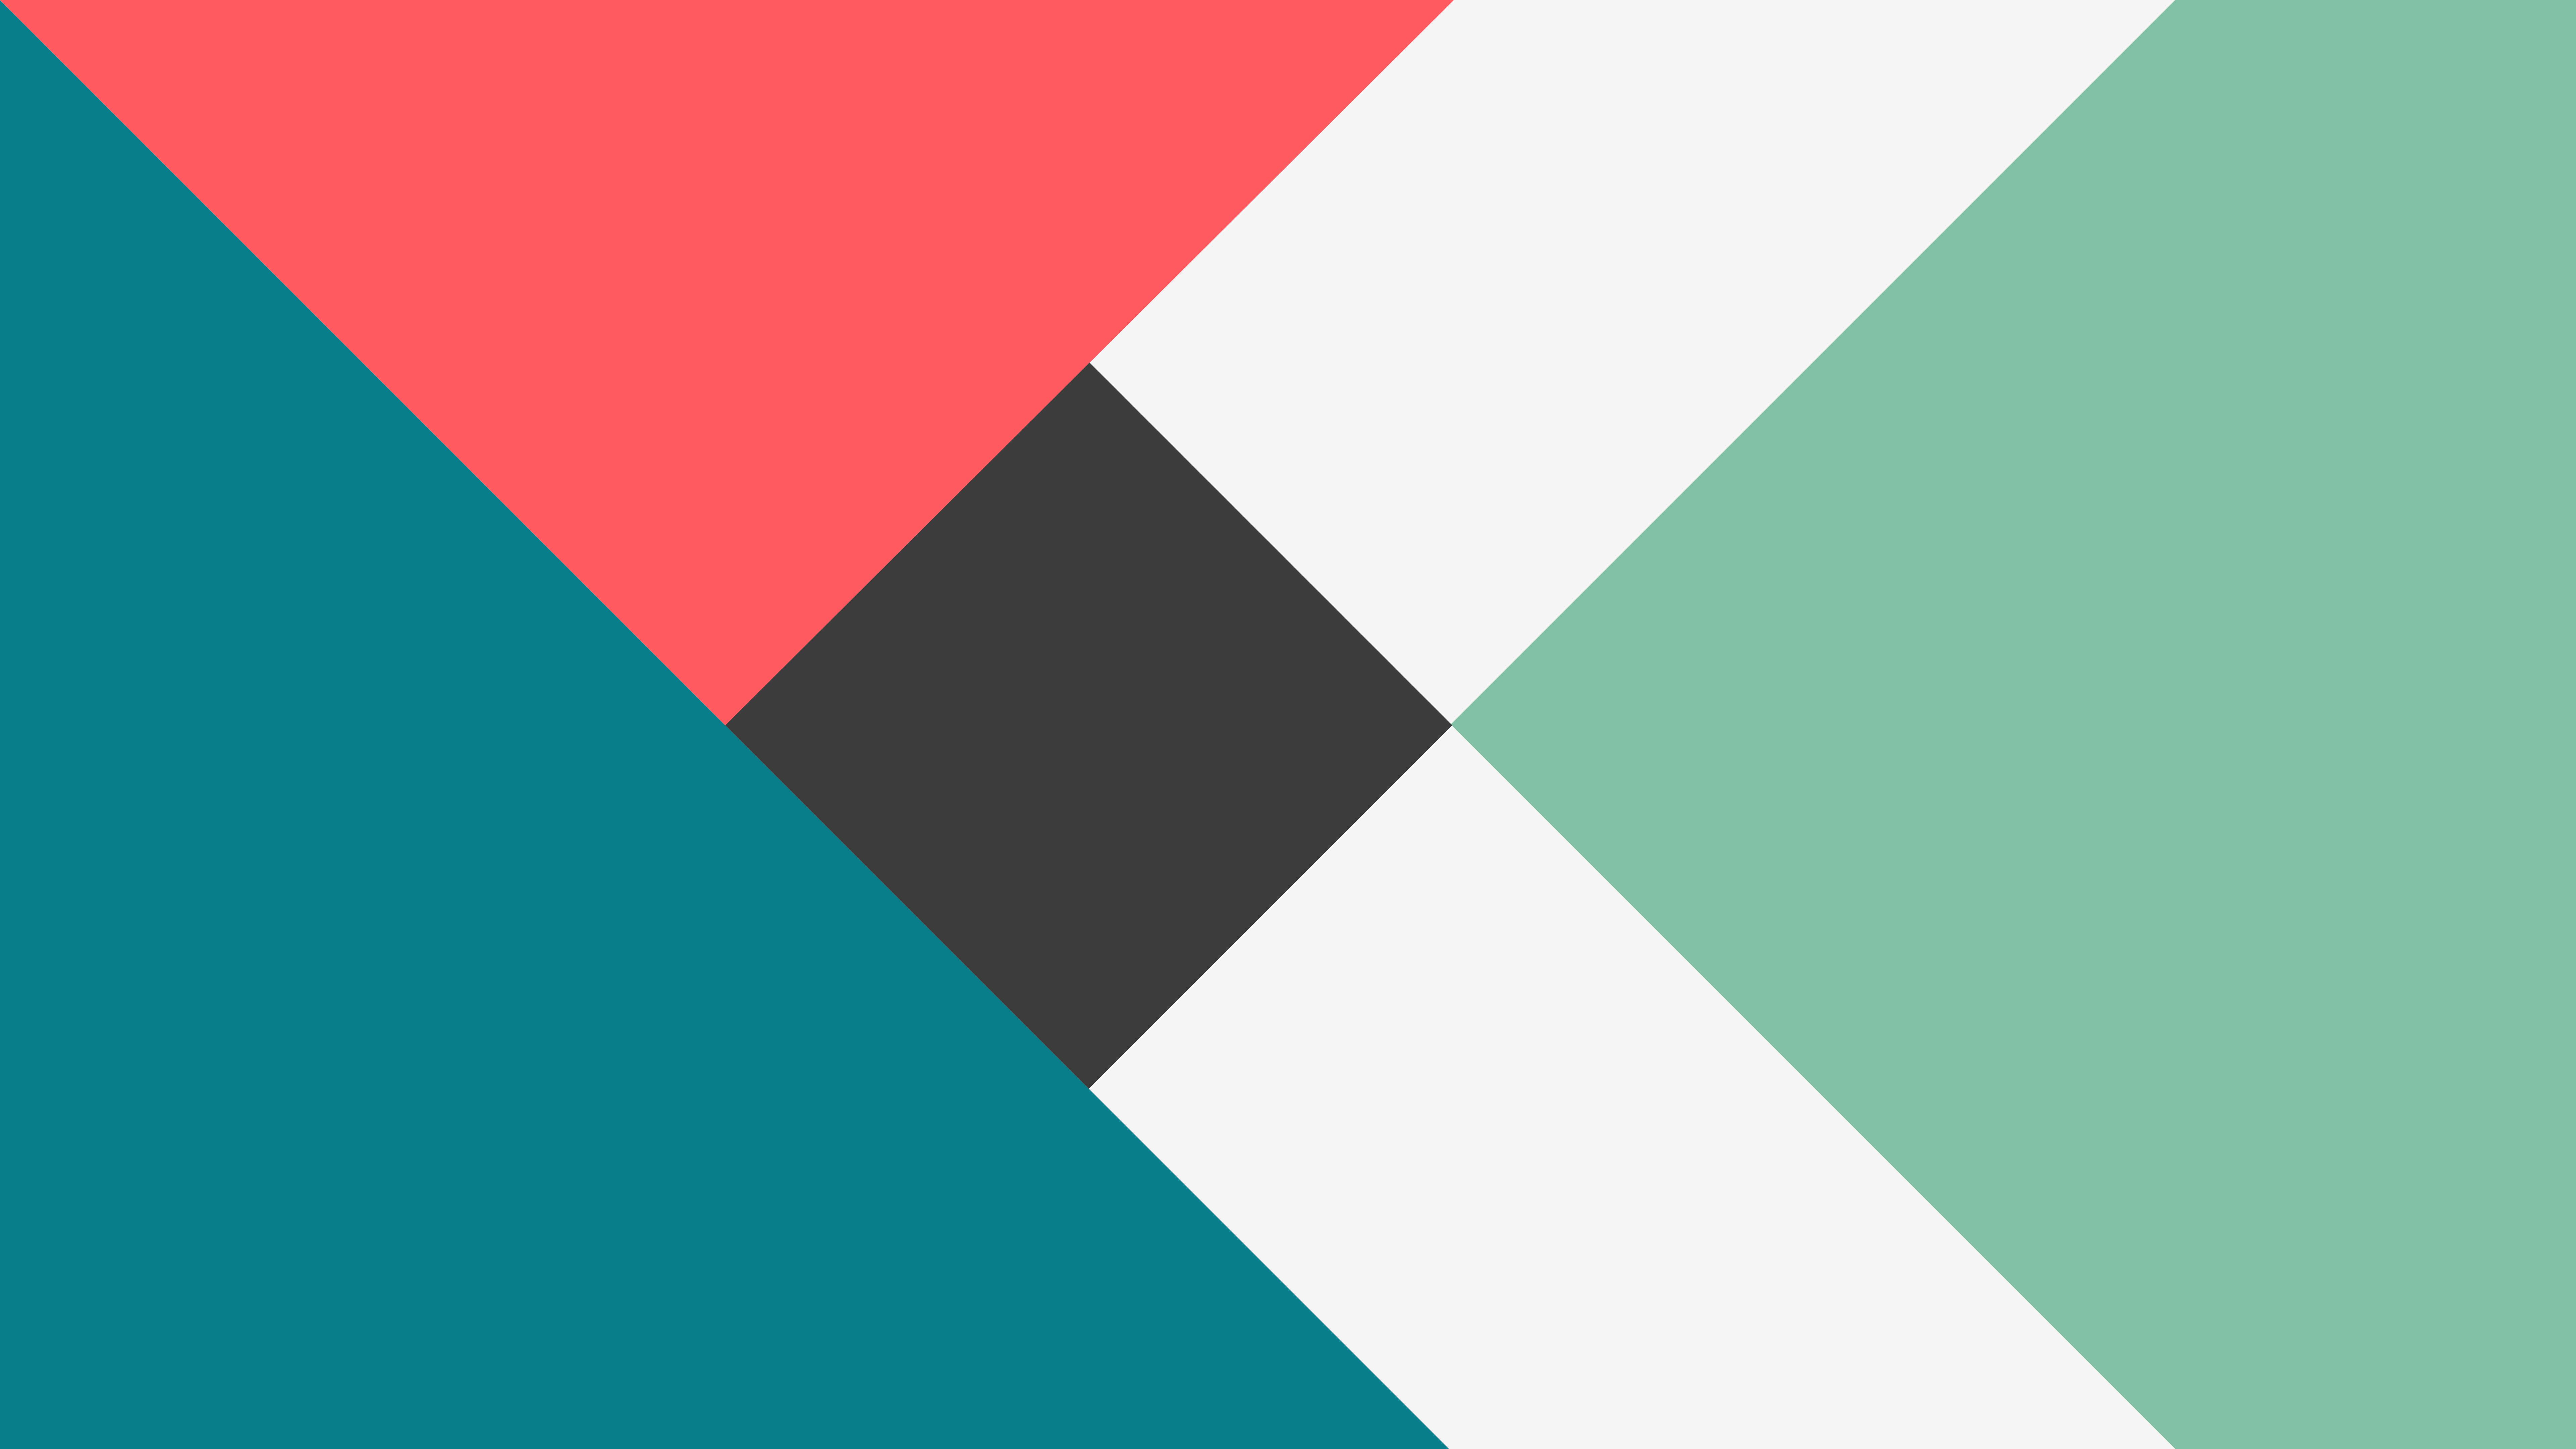 Minimalist background uhd 8k wallpaper pixelz - 8k minimal wallpaper ...